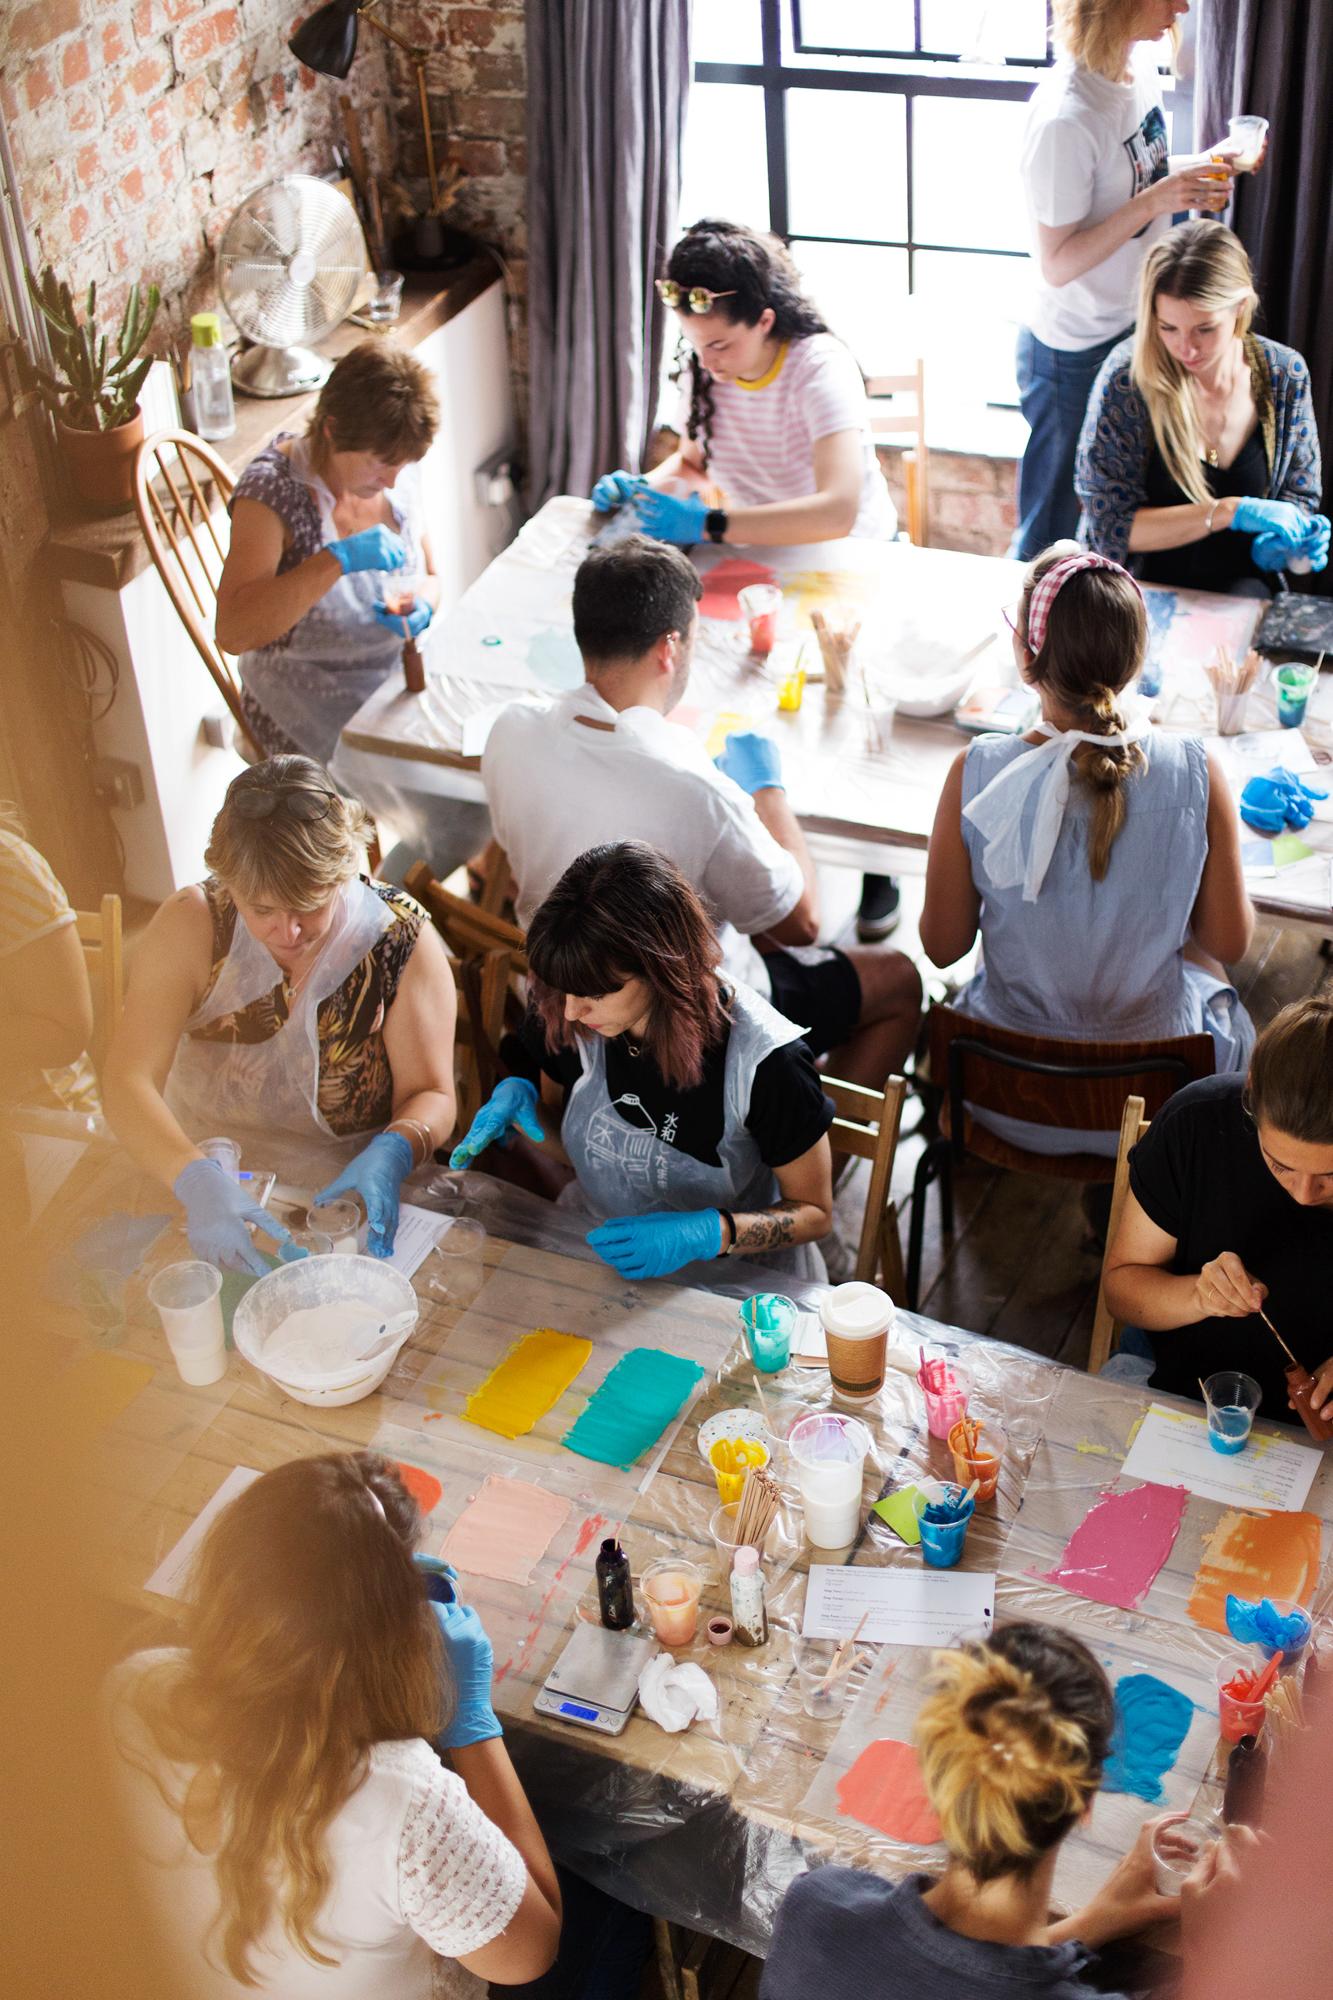 Modern art and craft classes in Bristol workshop. Making Jesmonite Terrazzo tiles at creative workshop with Katie Gilles